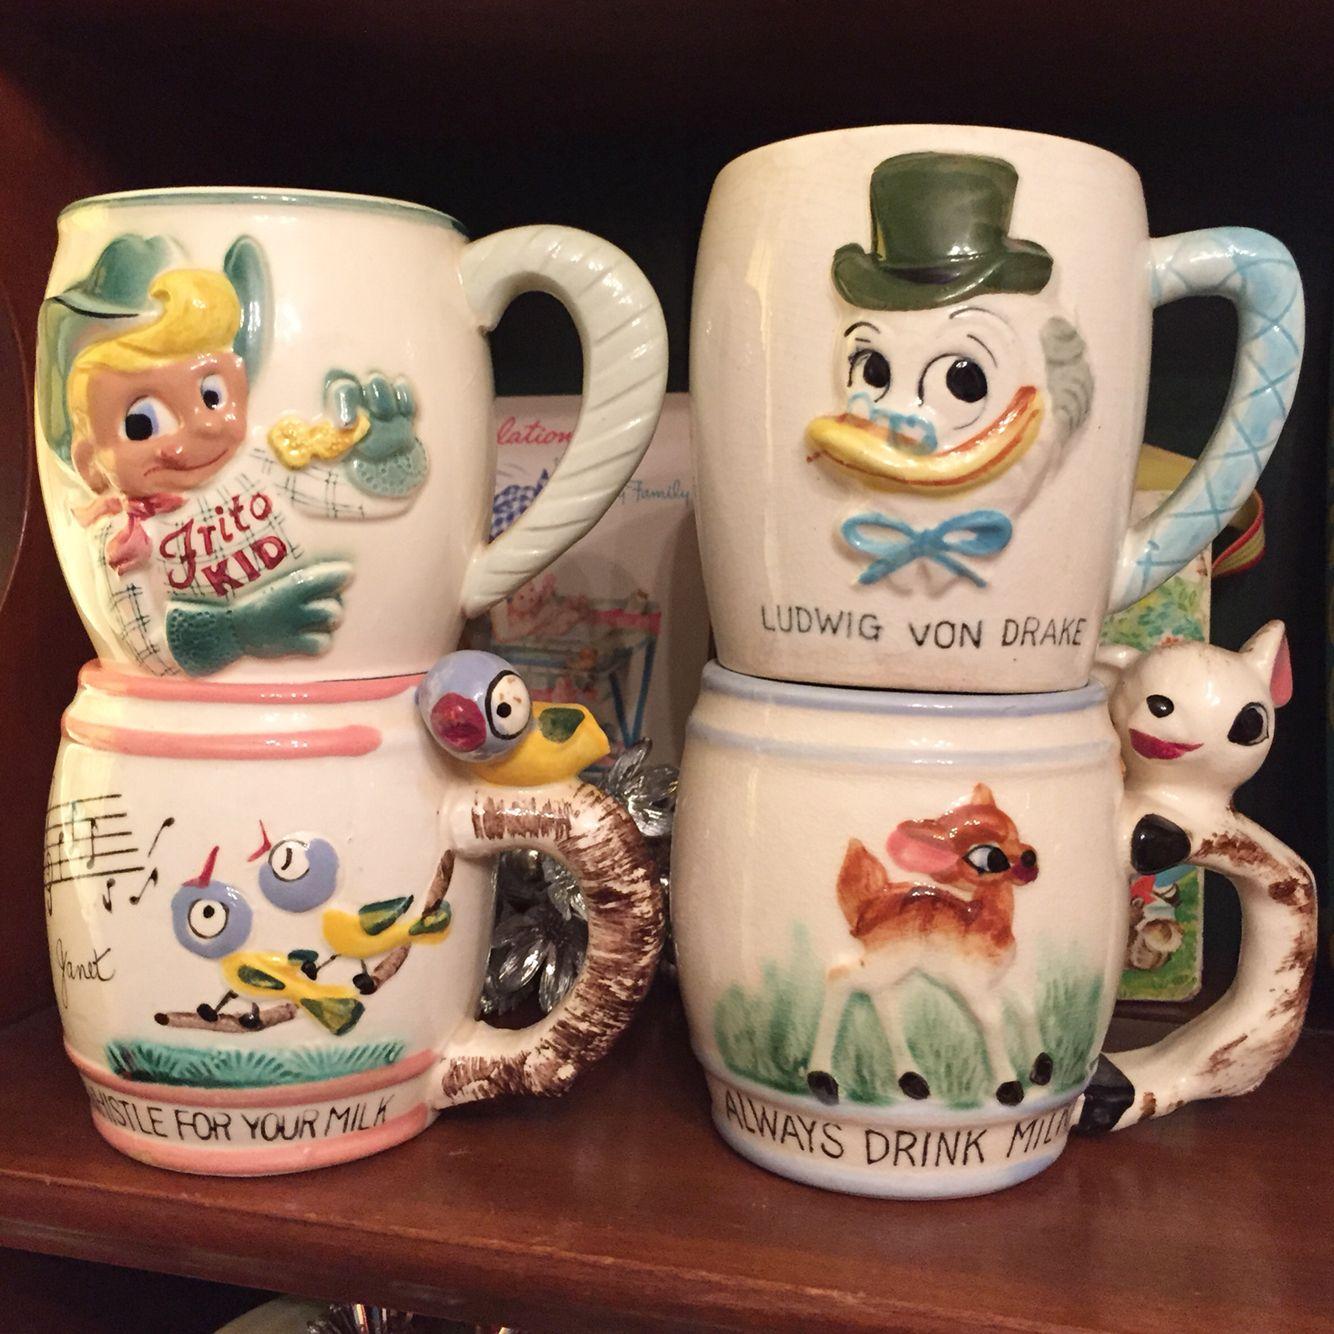 1950 S Children S Ceramic Mug Obsession Vintage Kitsch Kitschy Decor Childrens Mugs